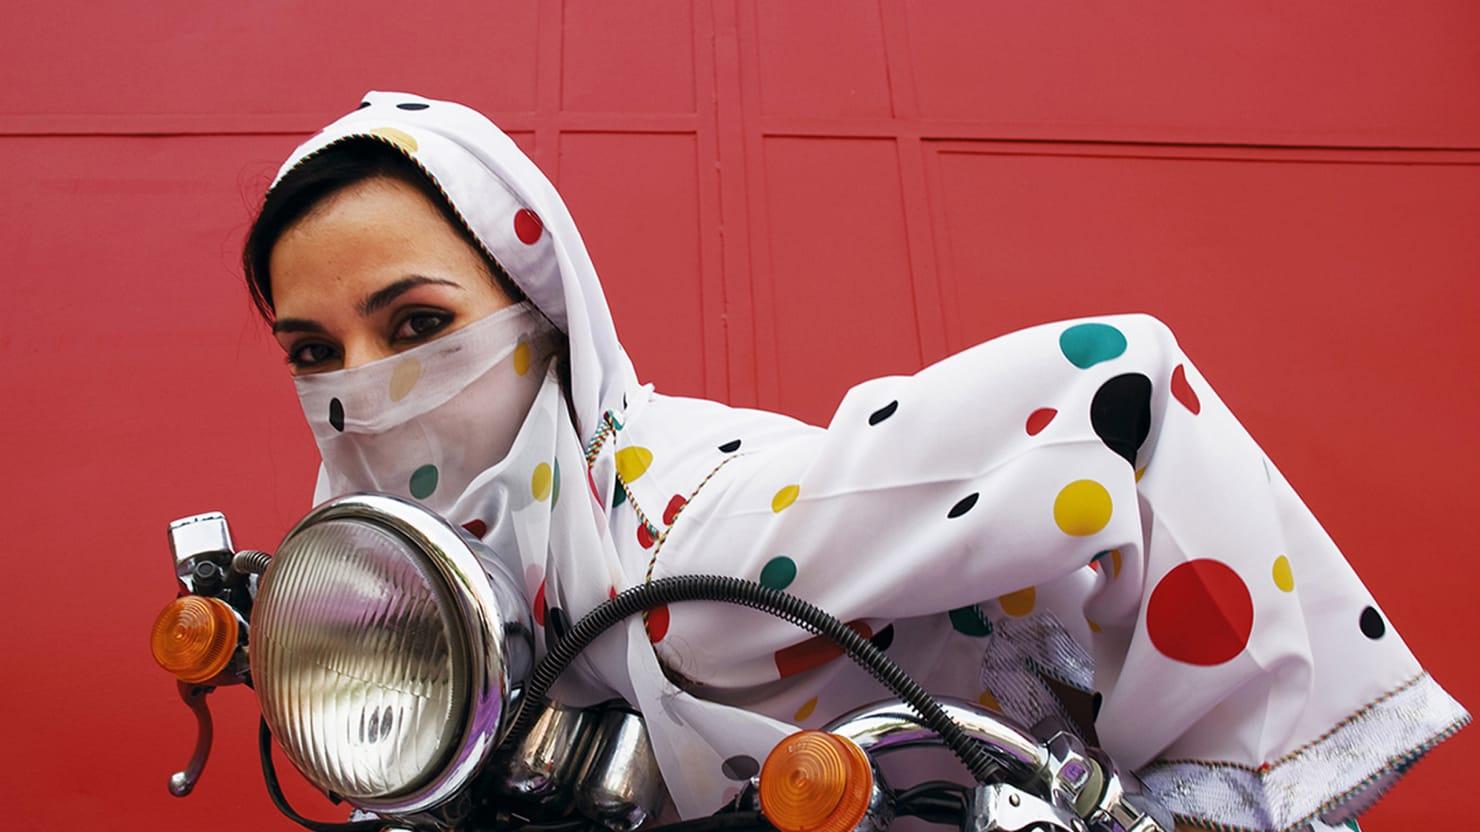 'Kesh Angels': The Biker Chicks of Morocco (Photos)